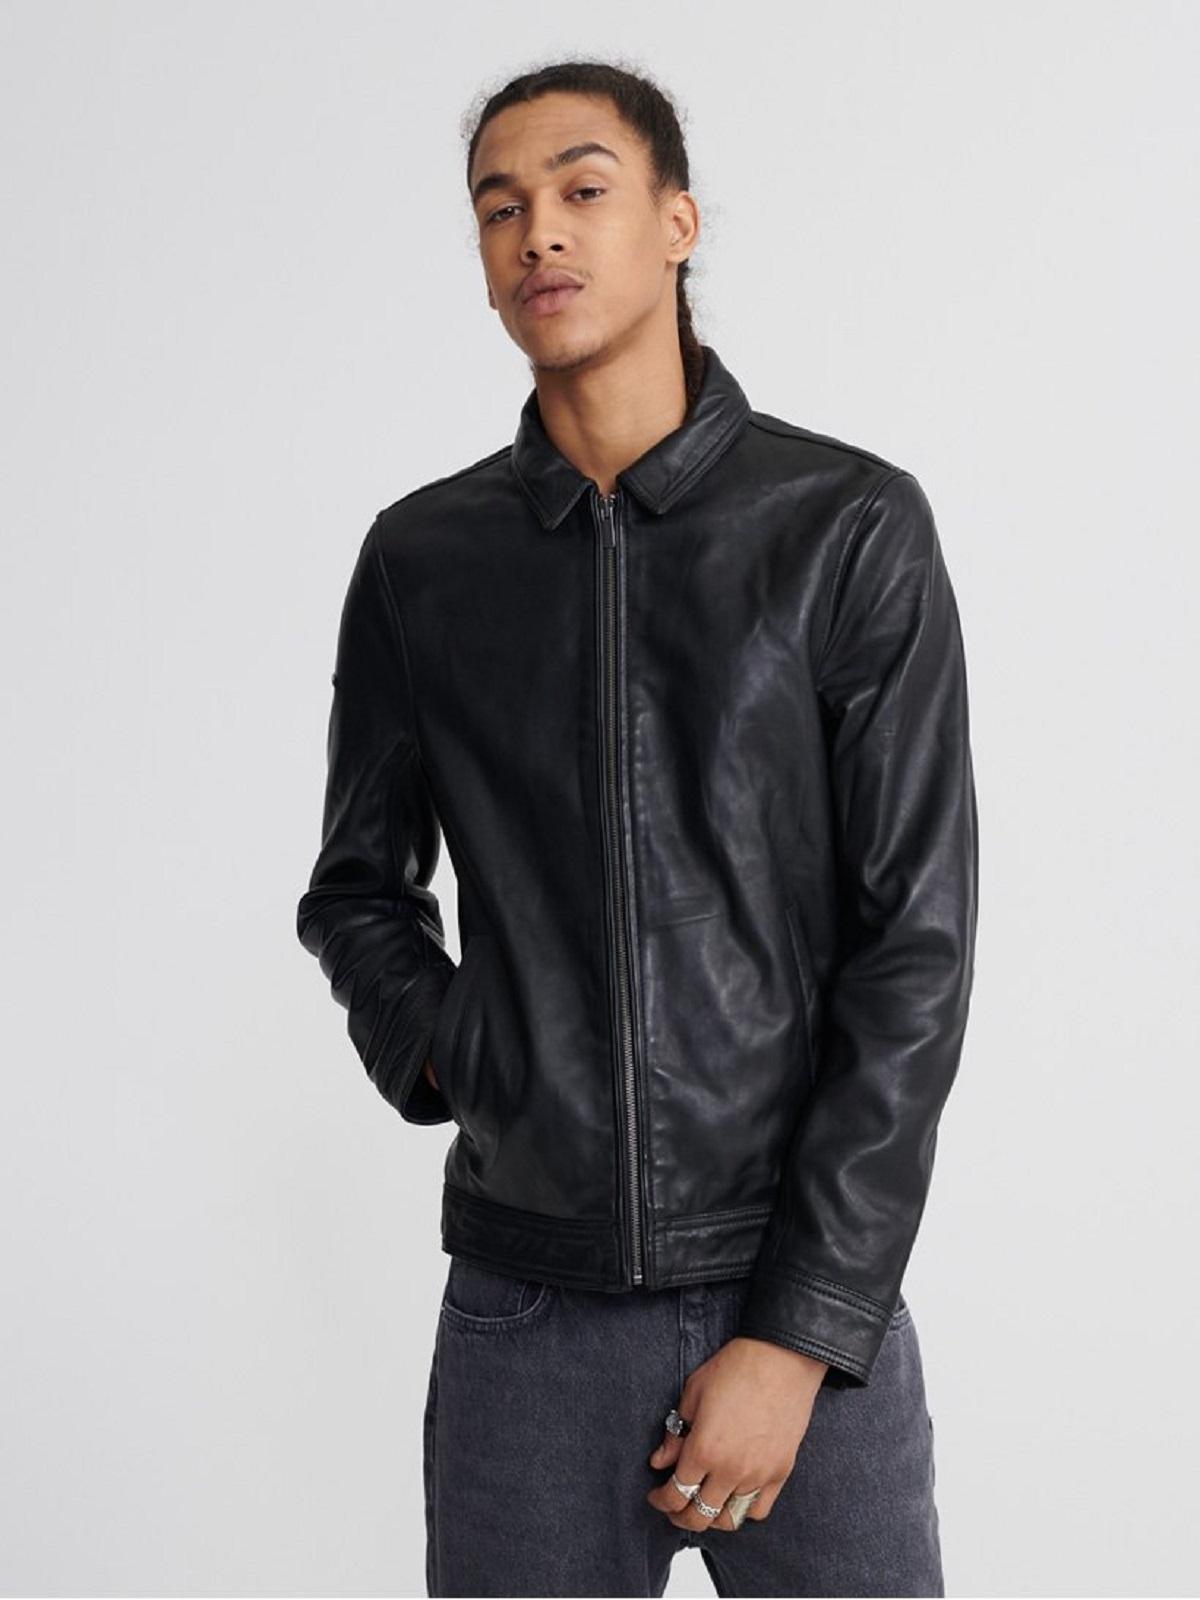 Casual Leather Jacket For Men | Men Jacket | MauveTree